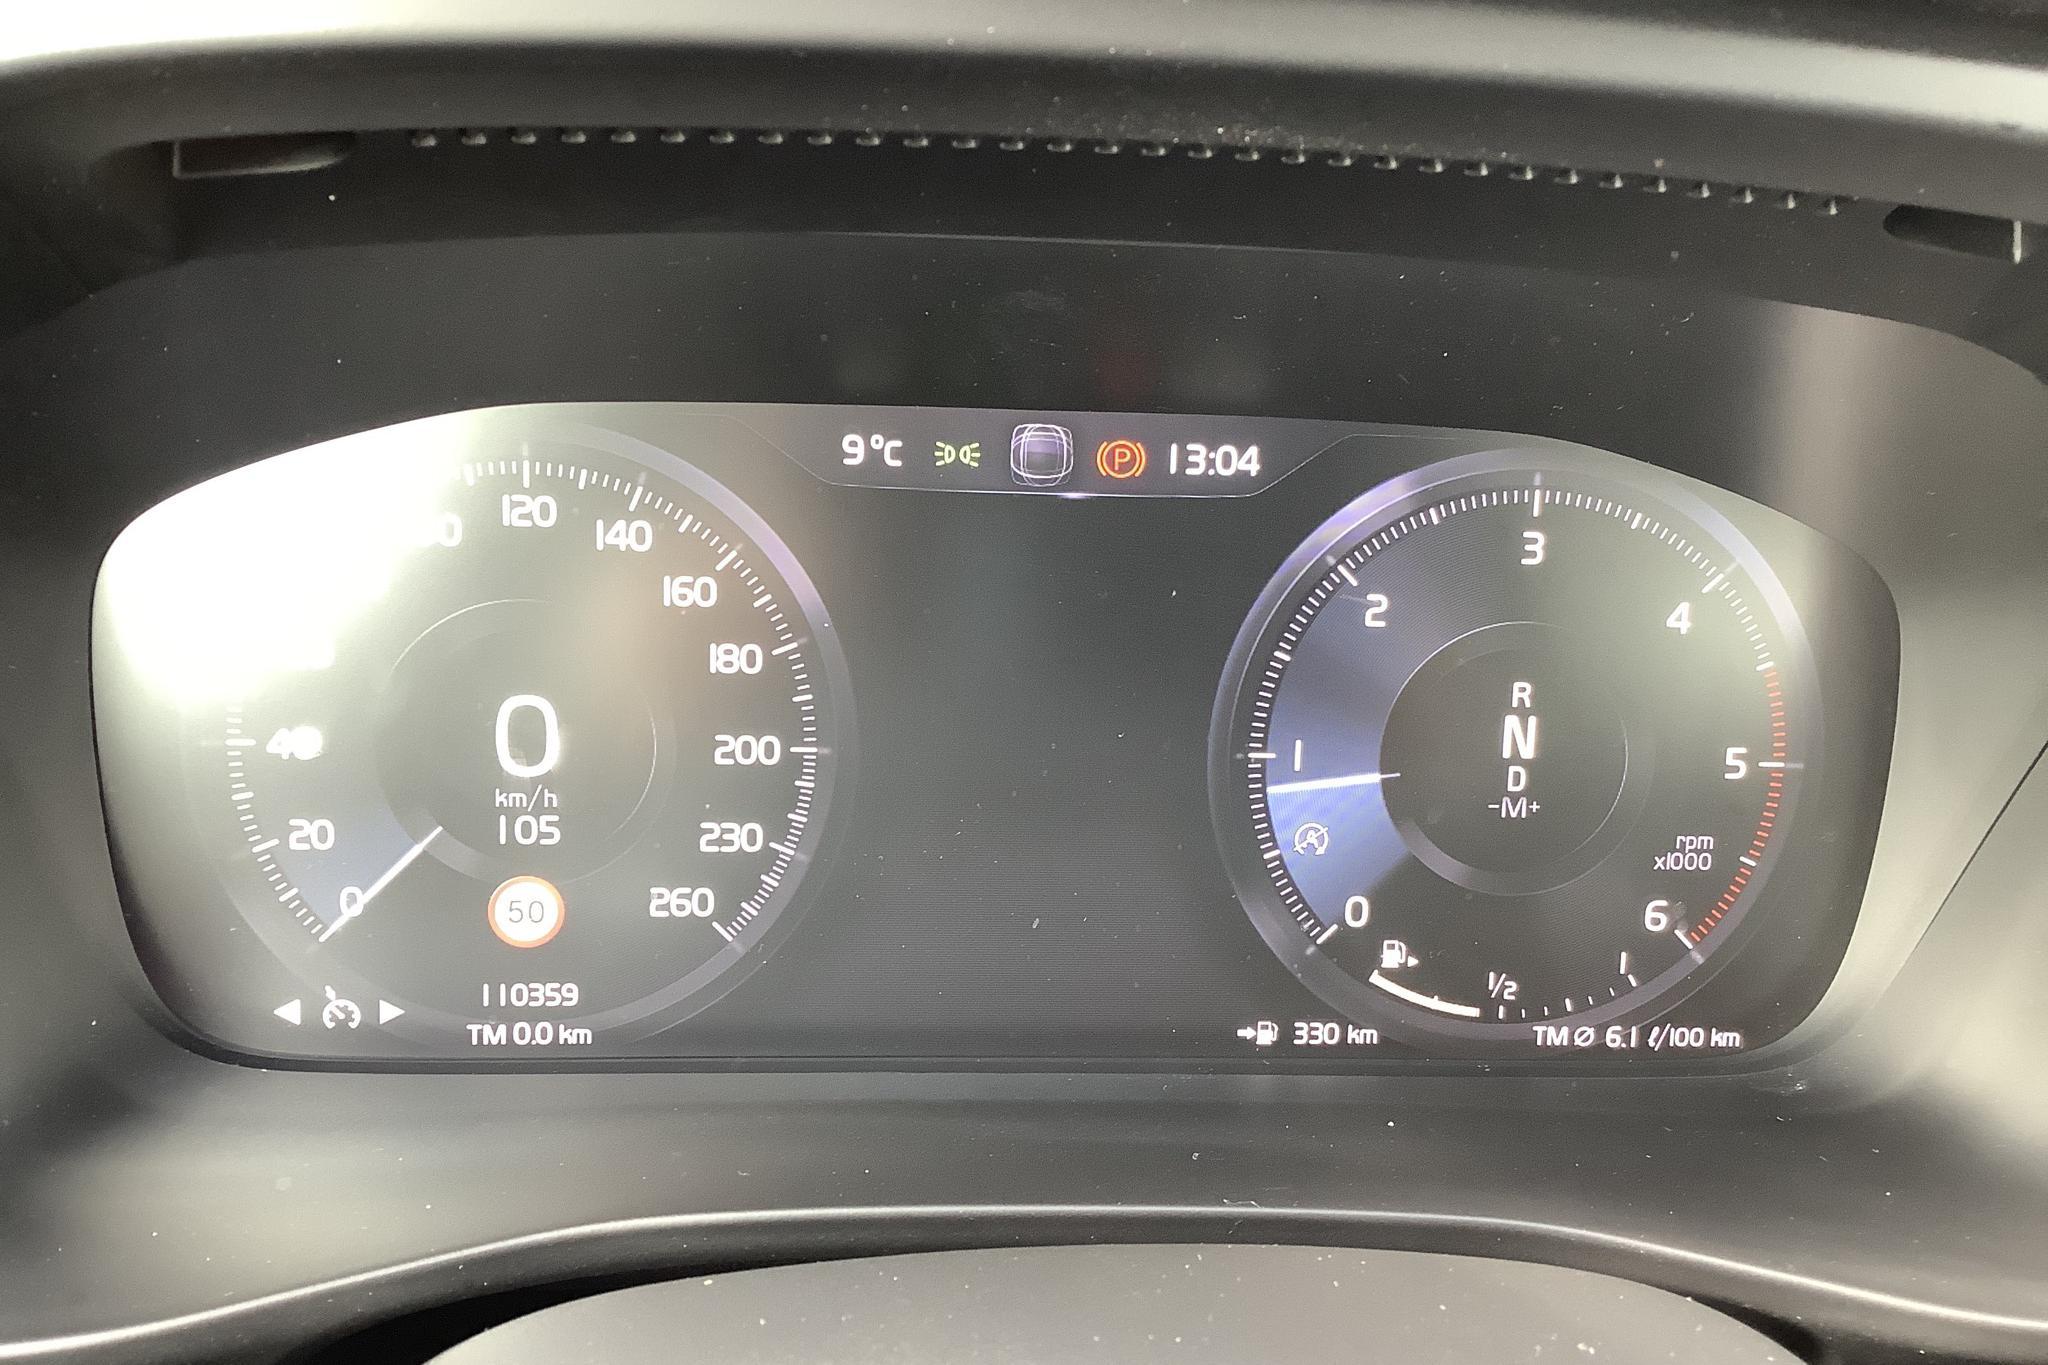 Volvo XC40 D3 2WD (150hk) - 110 350 km - Automatic - white - 2019